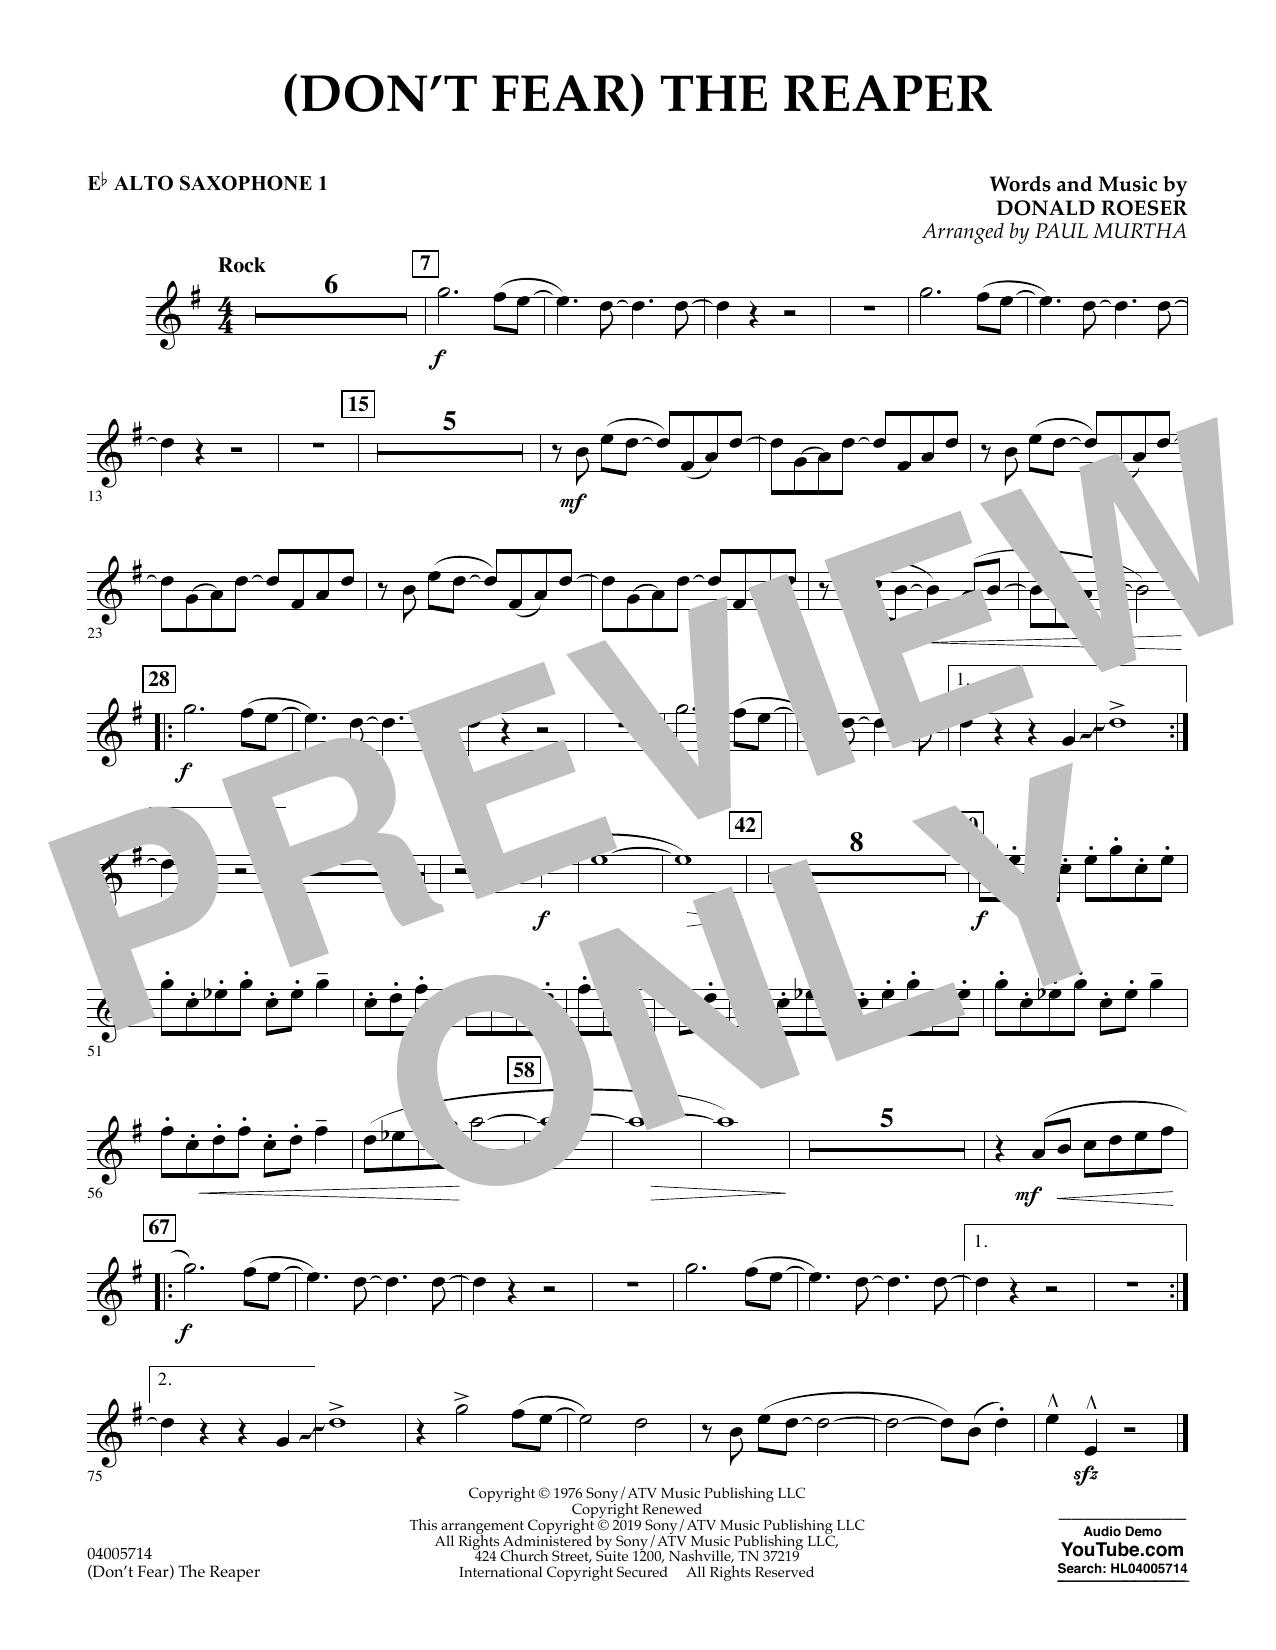 (Don't Fear) The Reaper (arr. Paul Murtha) - Eb Alto Saxophone 1 (Concert Band)